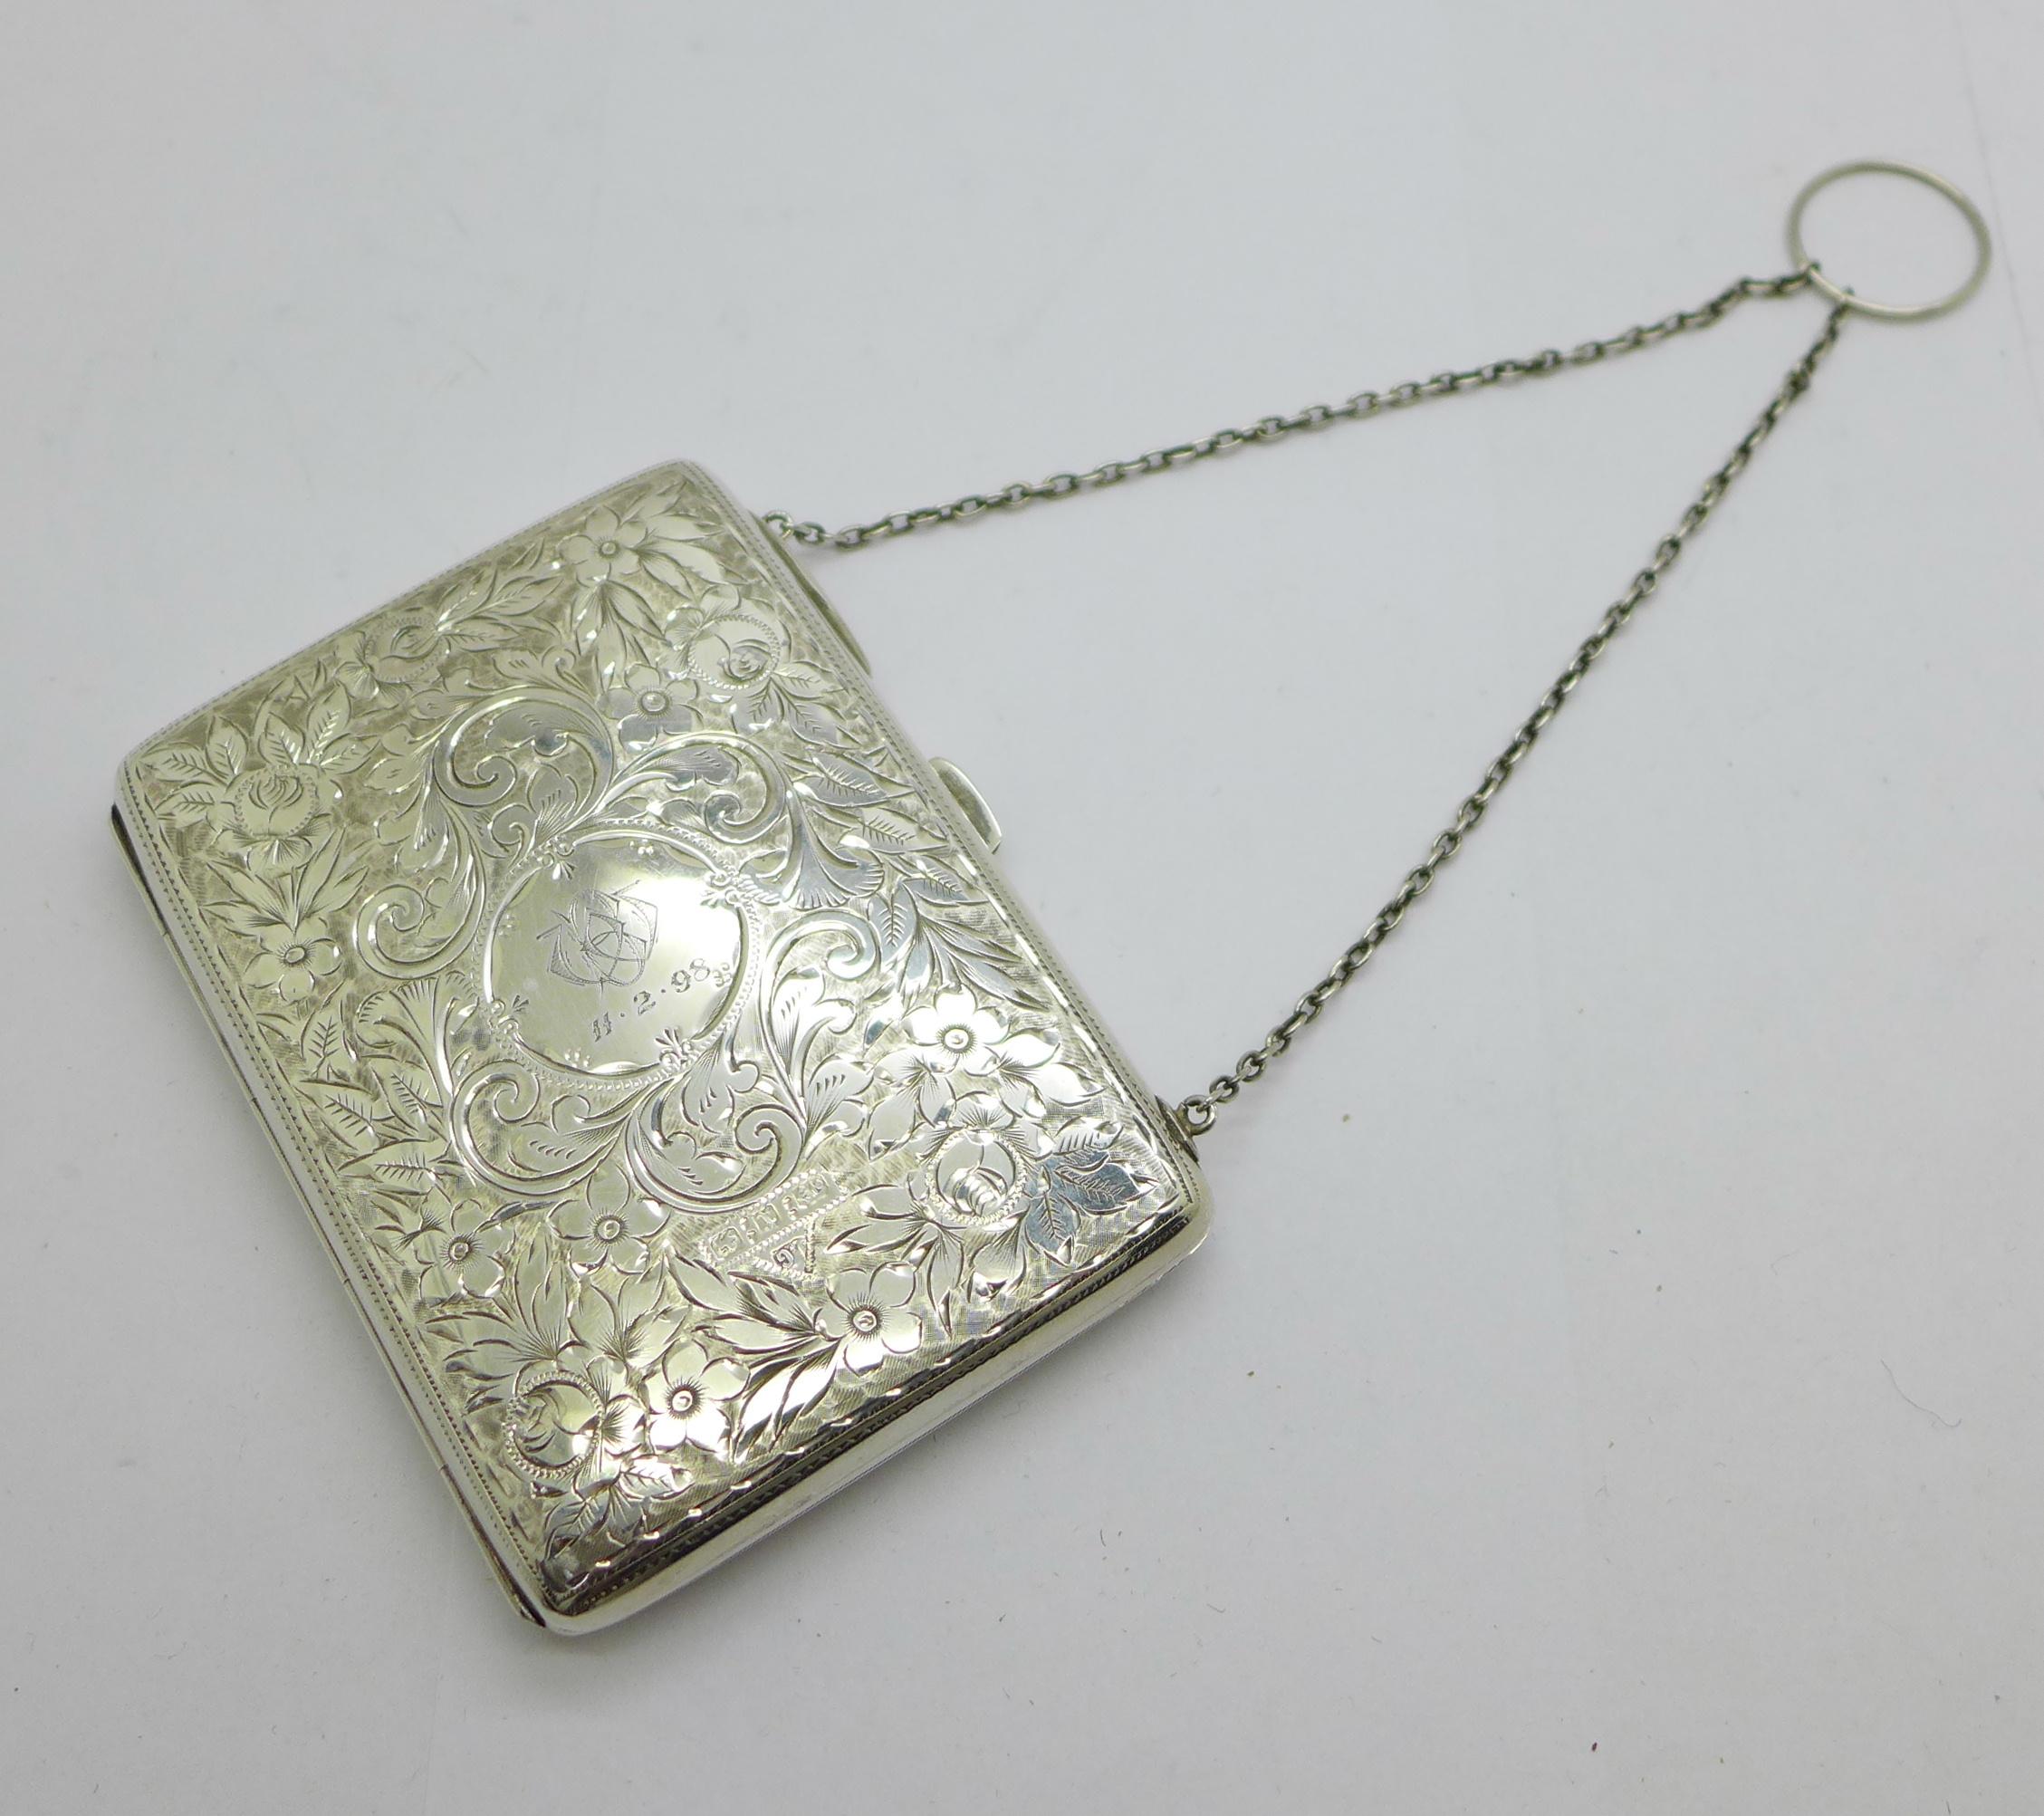 A late Victorian silver aide memoire purse, Joseph Gloster, Birmingham 1897, and a silver propelling